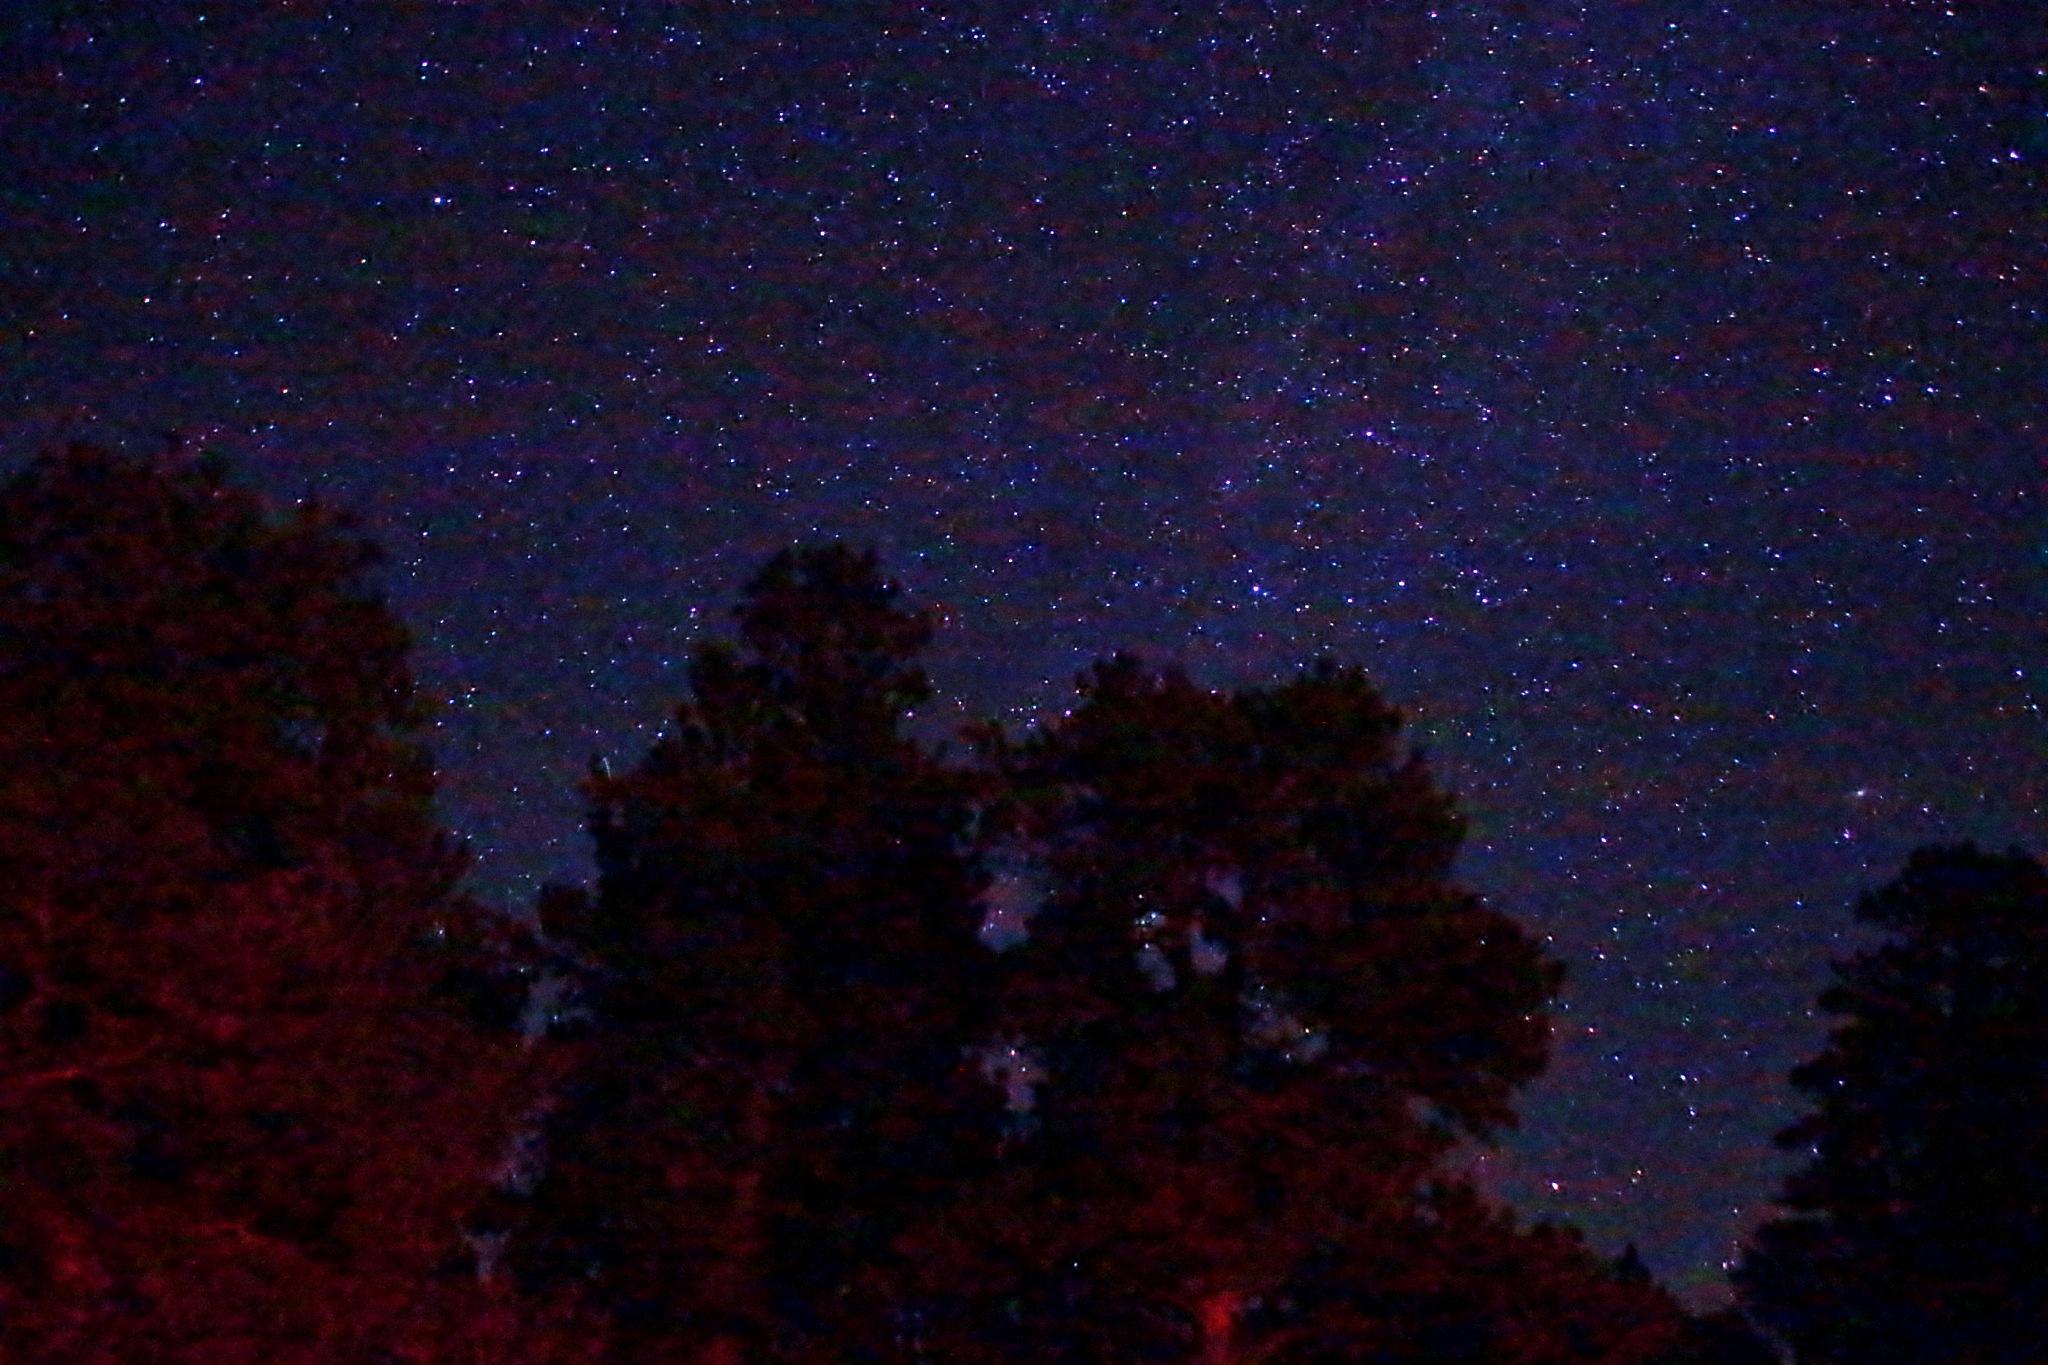 Star Light Star Bright by yehaa_2001